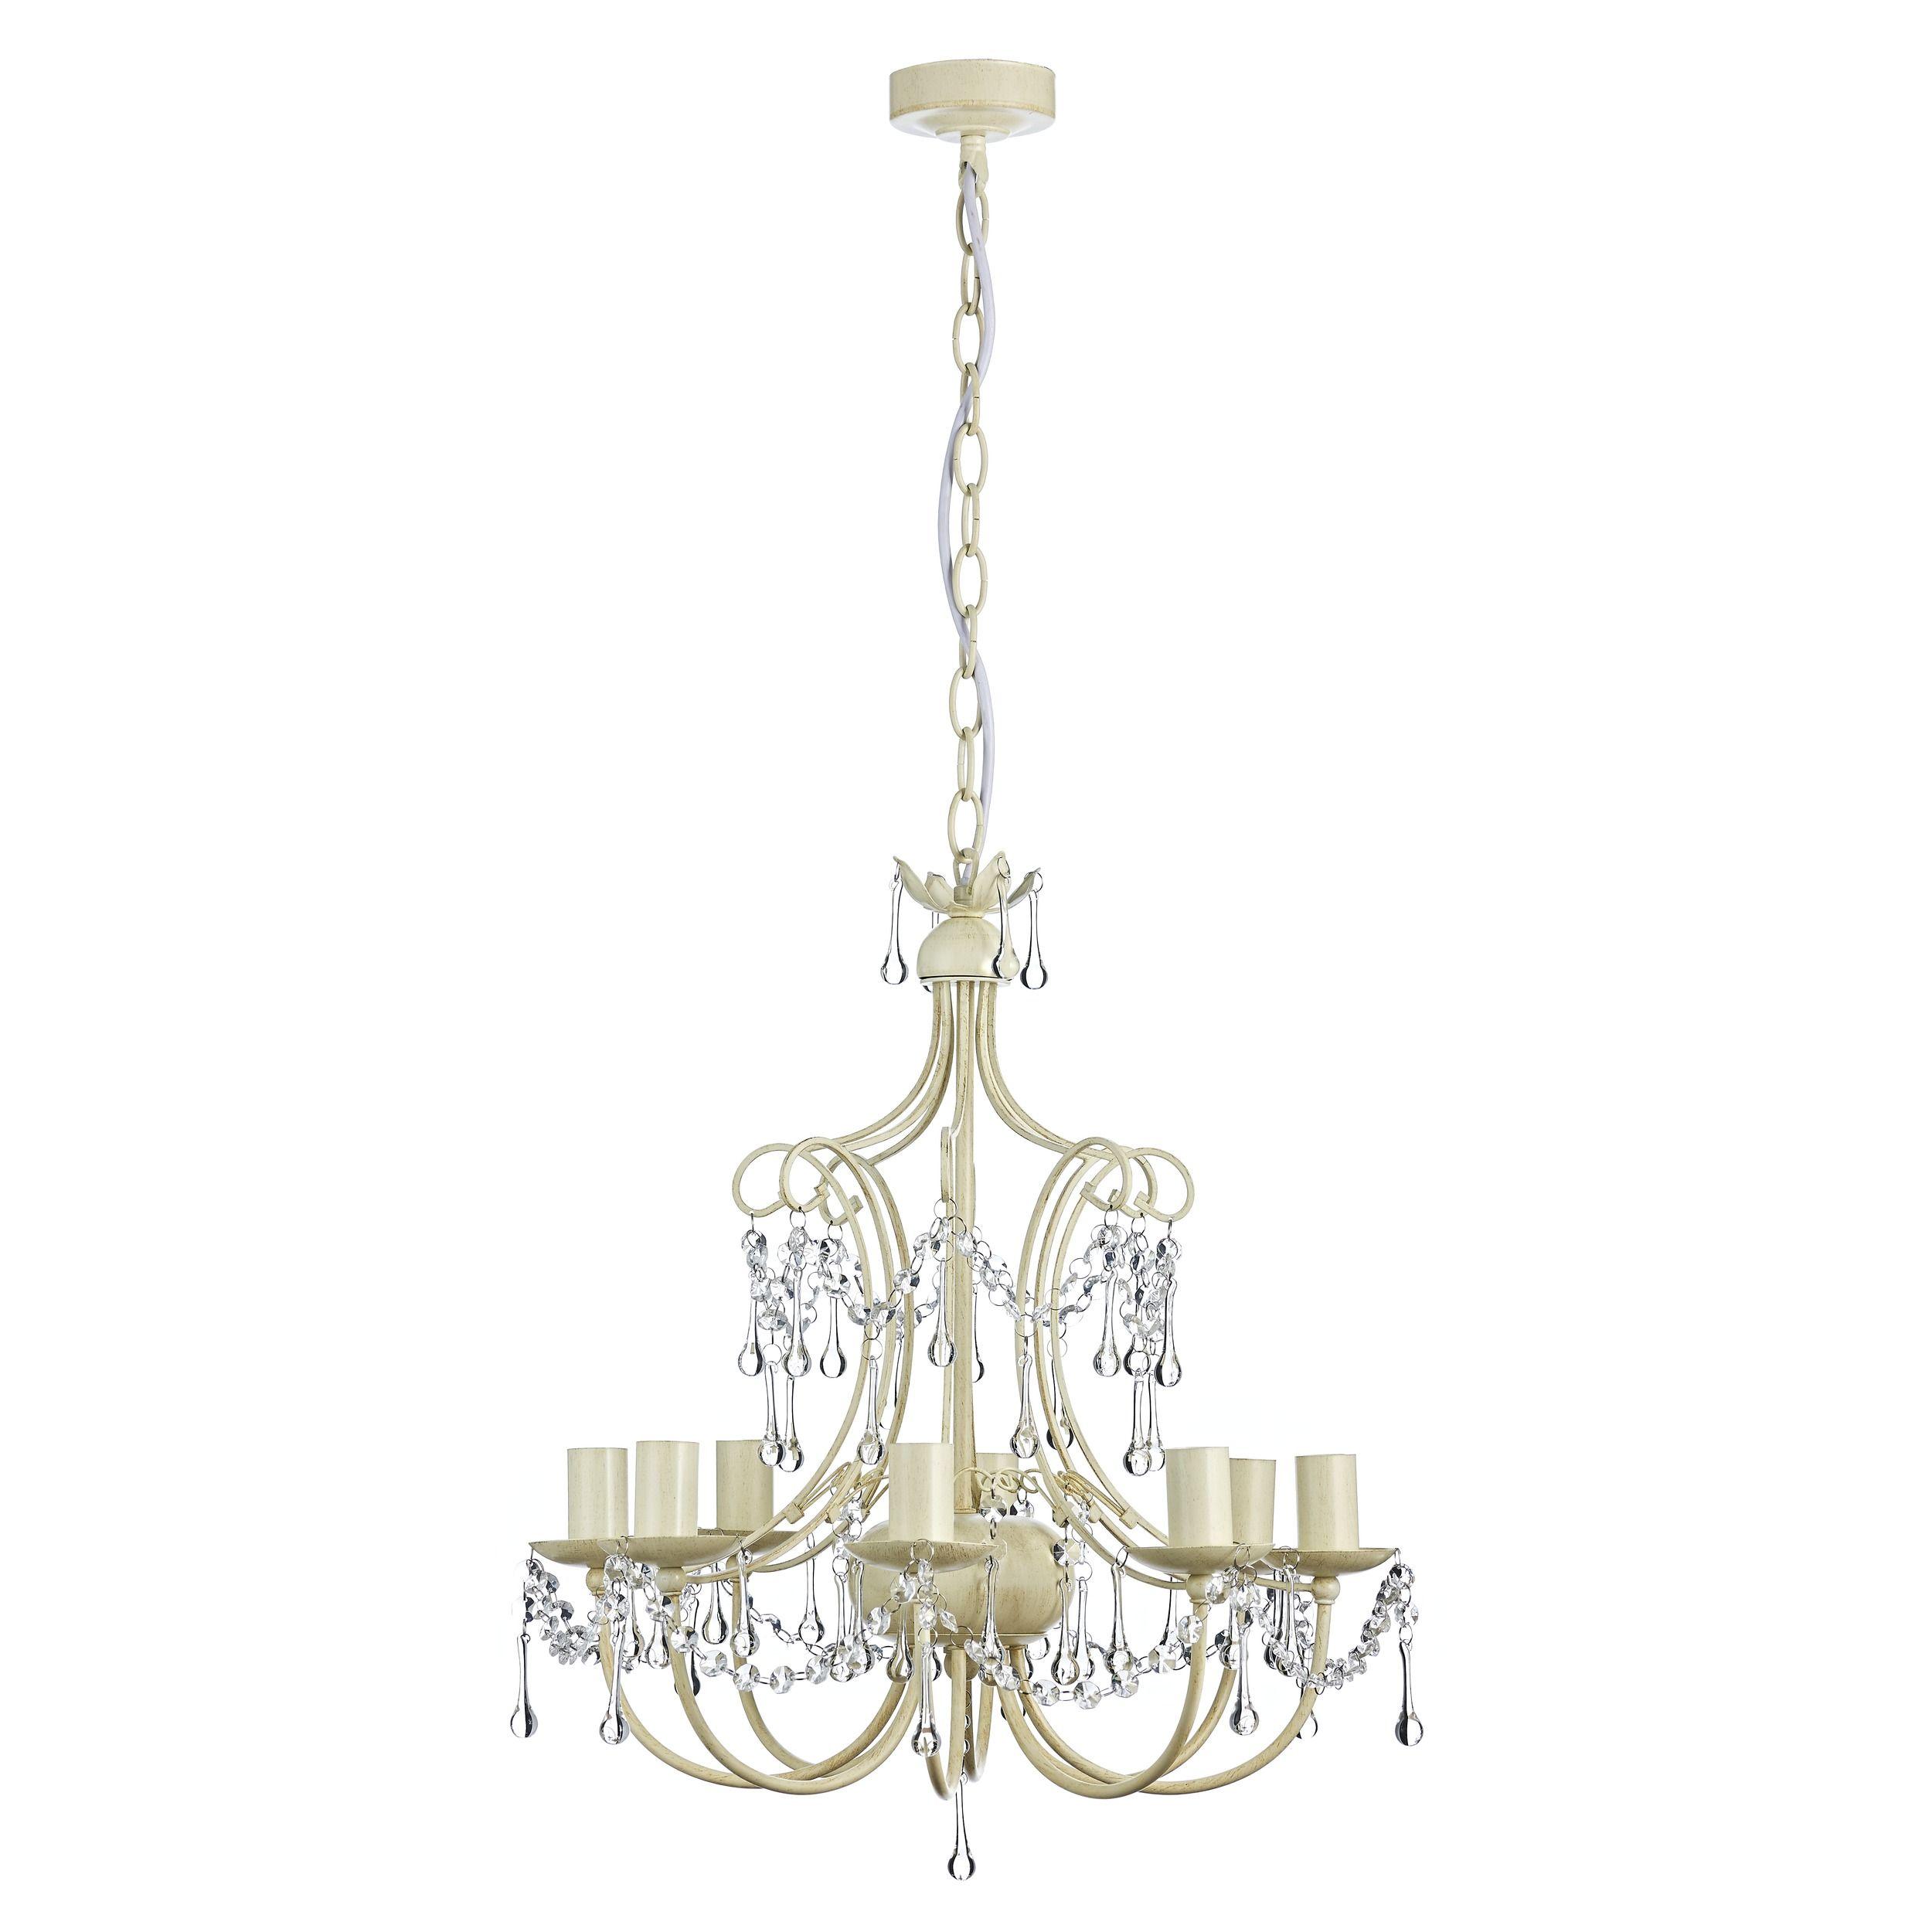 Chella Cream 5 Light Chandelier   5 light chandelier